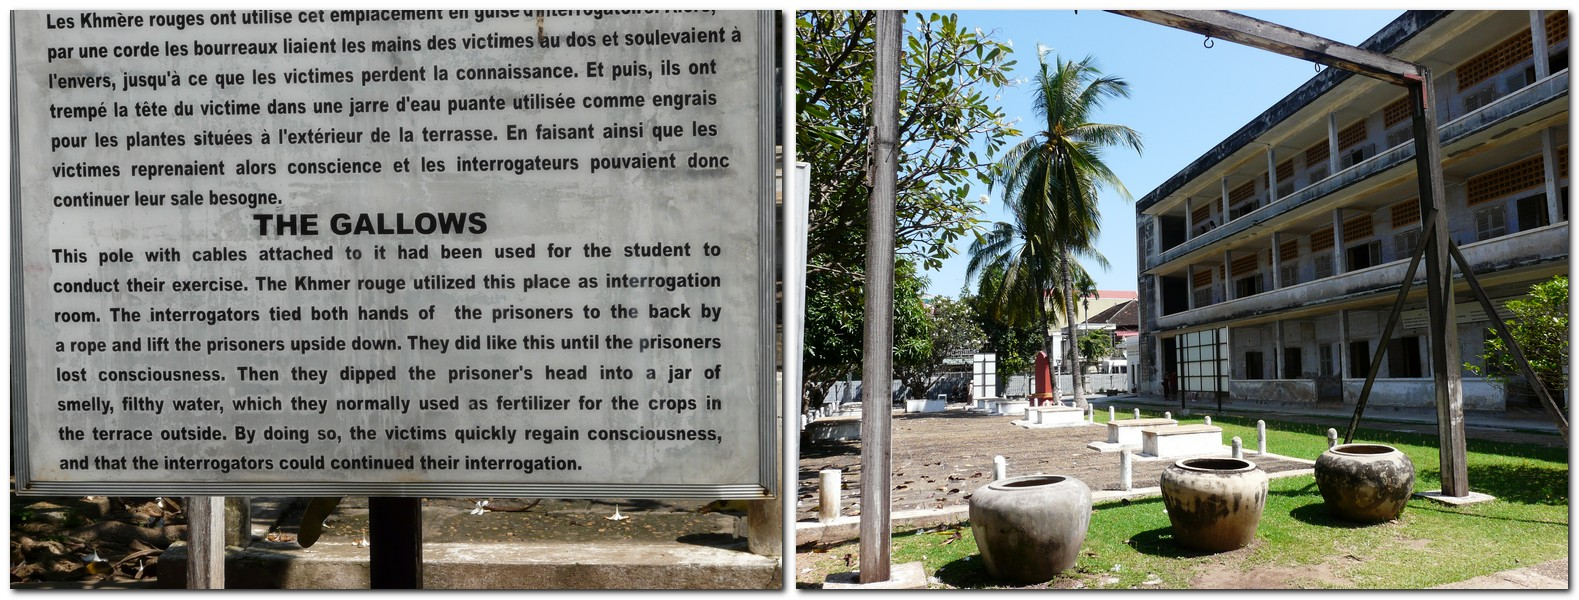 Tuol Sleng Genocide Museum Phnom Penh